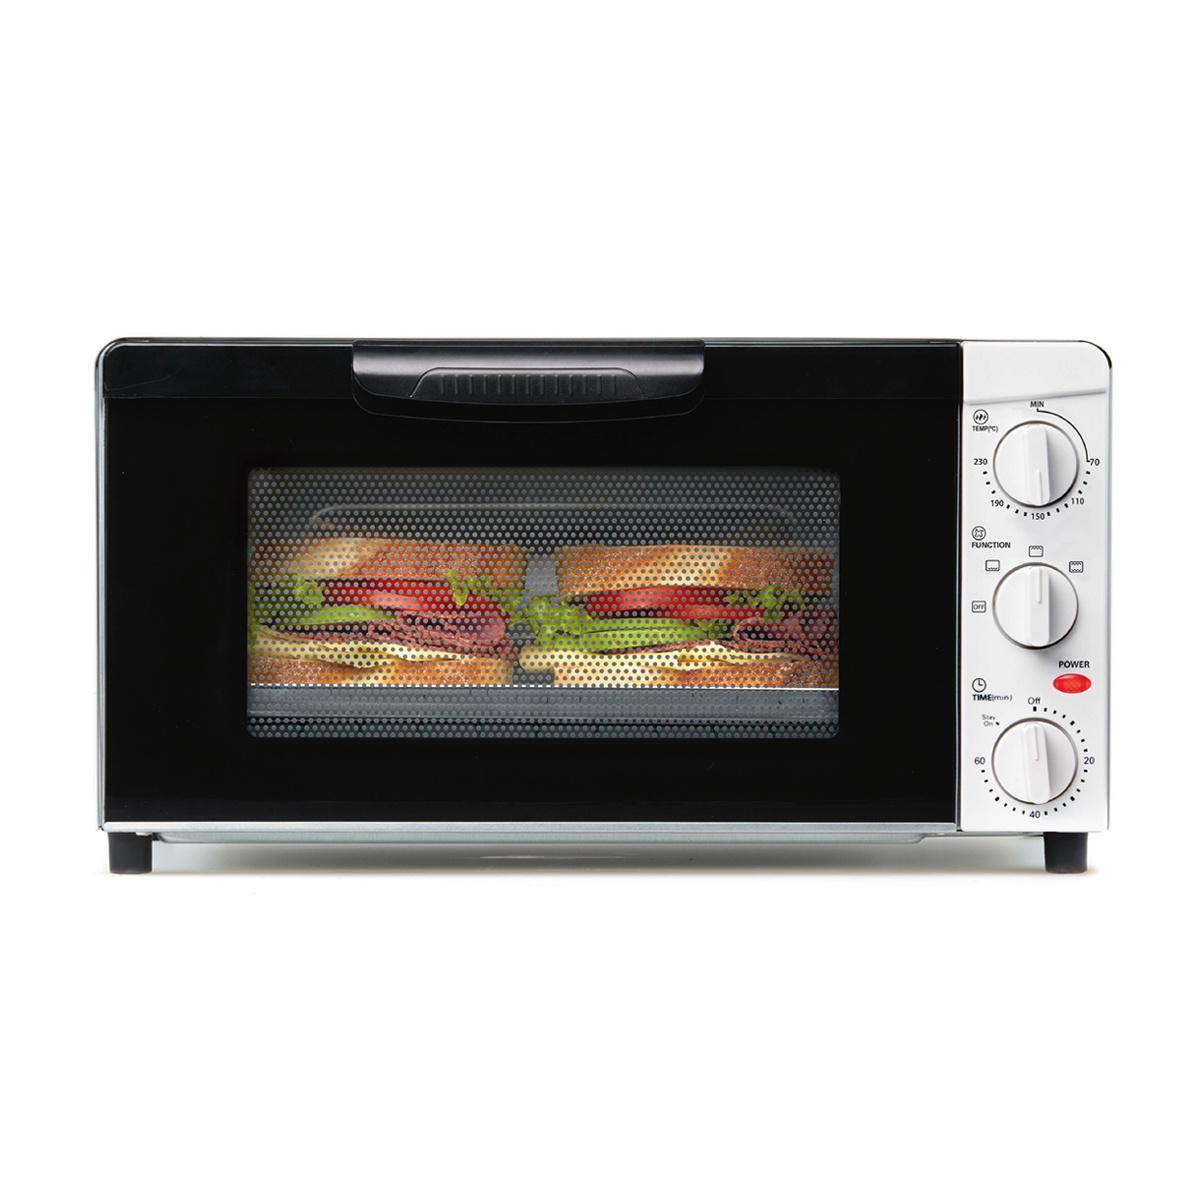 Kmart 18 Litre Toaster Oven Reviews Productreview Com Au